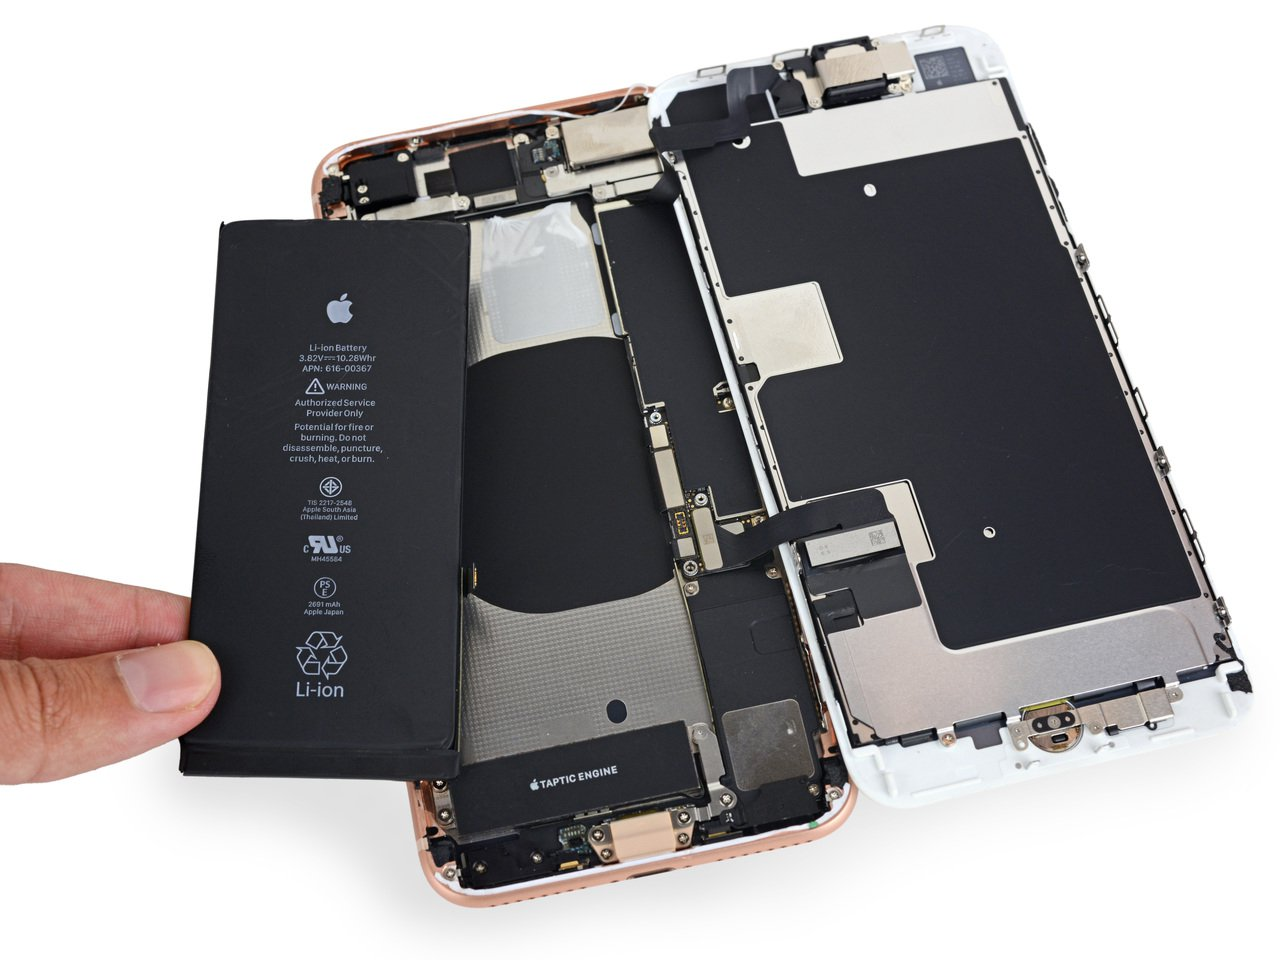 外媒《iFixit》拆解iPhone 8 Plus的電池。 圖擷自iFixit